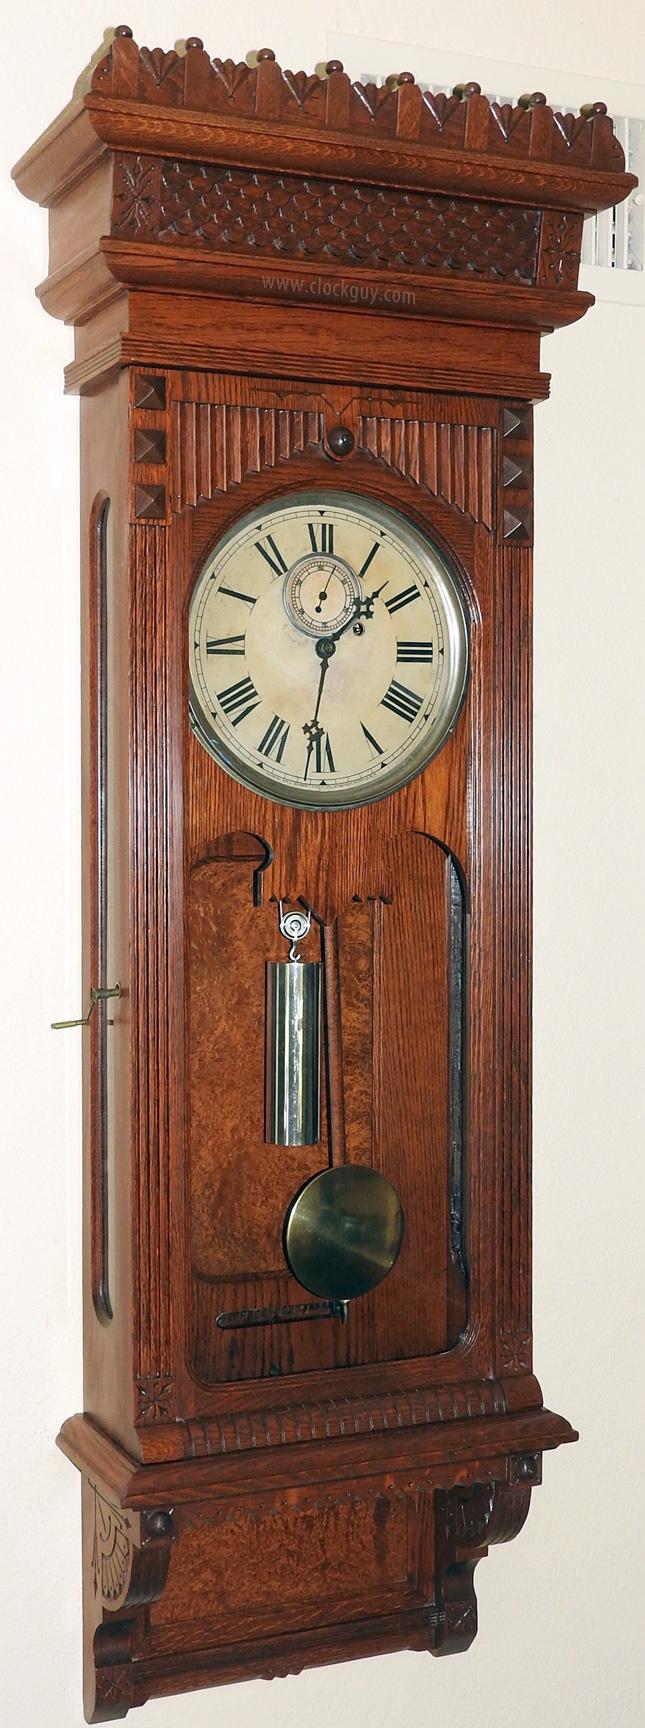 William L Gilbert Clock Company Antique Clocks Guy